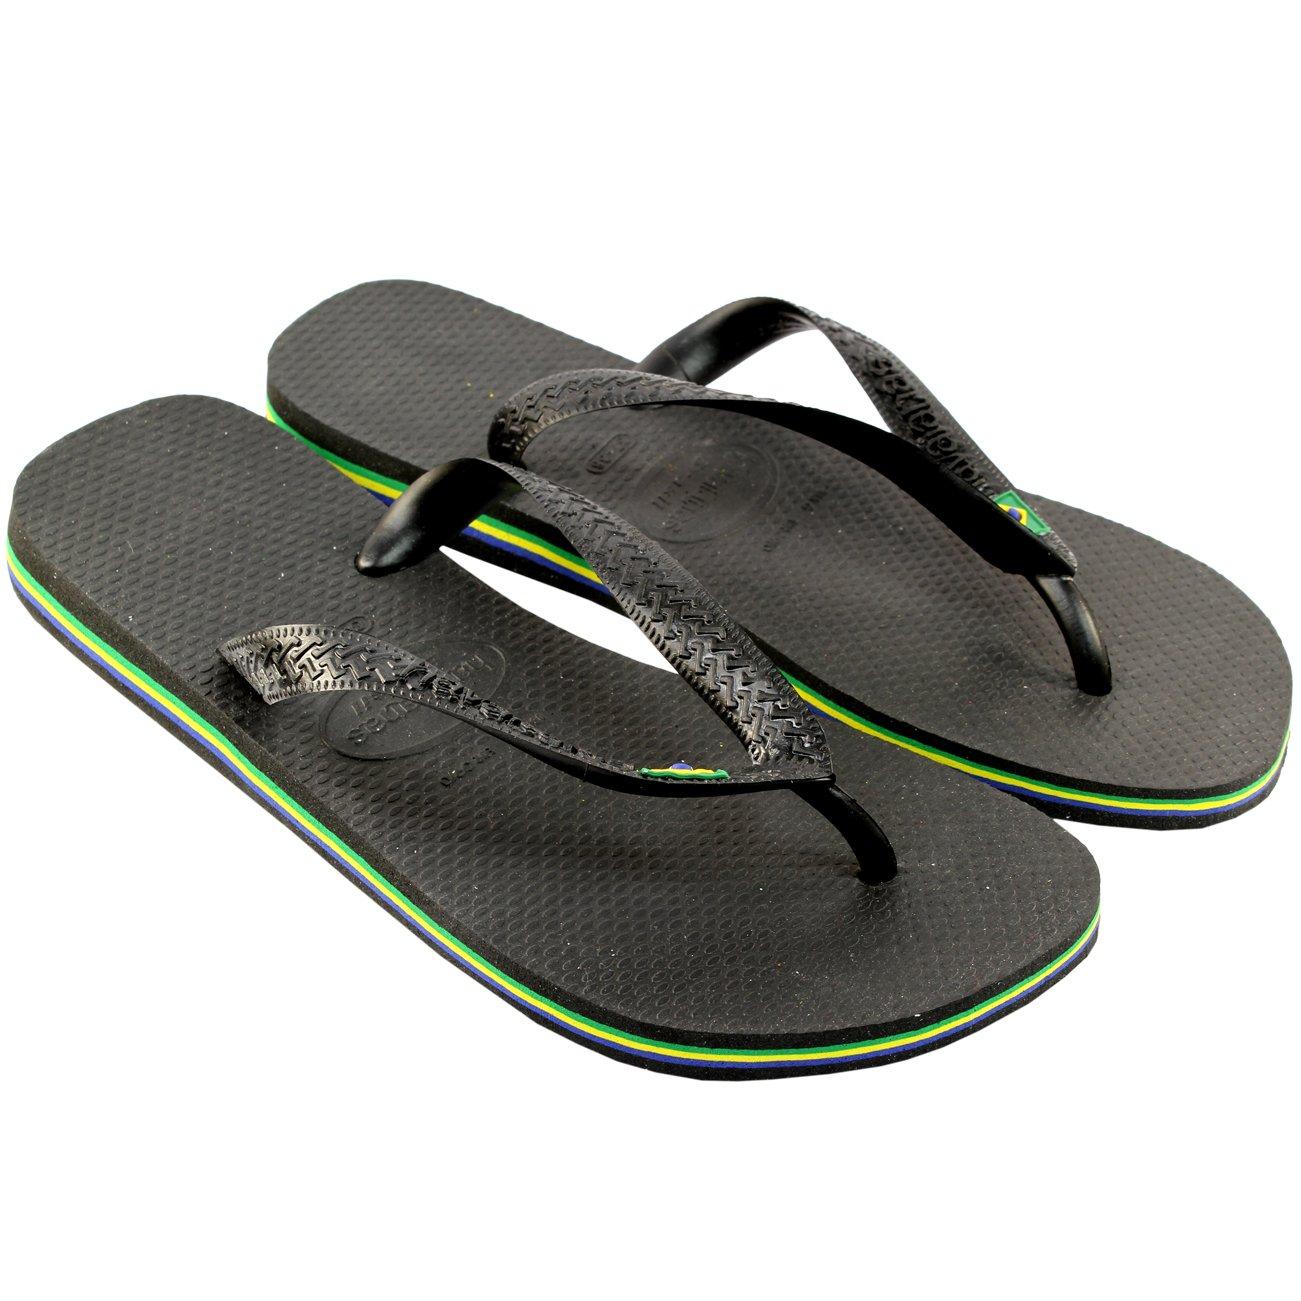 Herren Sandalen Havaianas Brasil Flip Flop Sandals  37/38 EU Schwarz